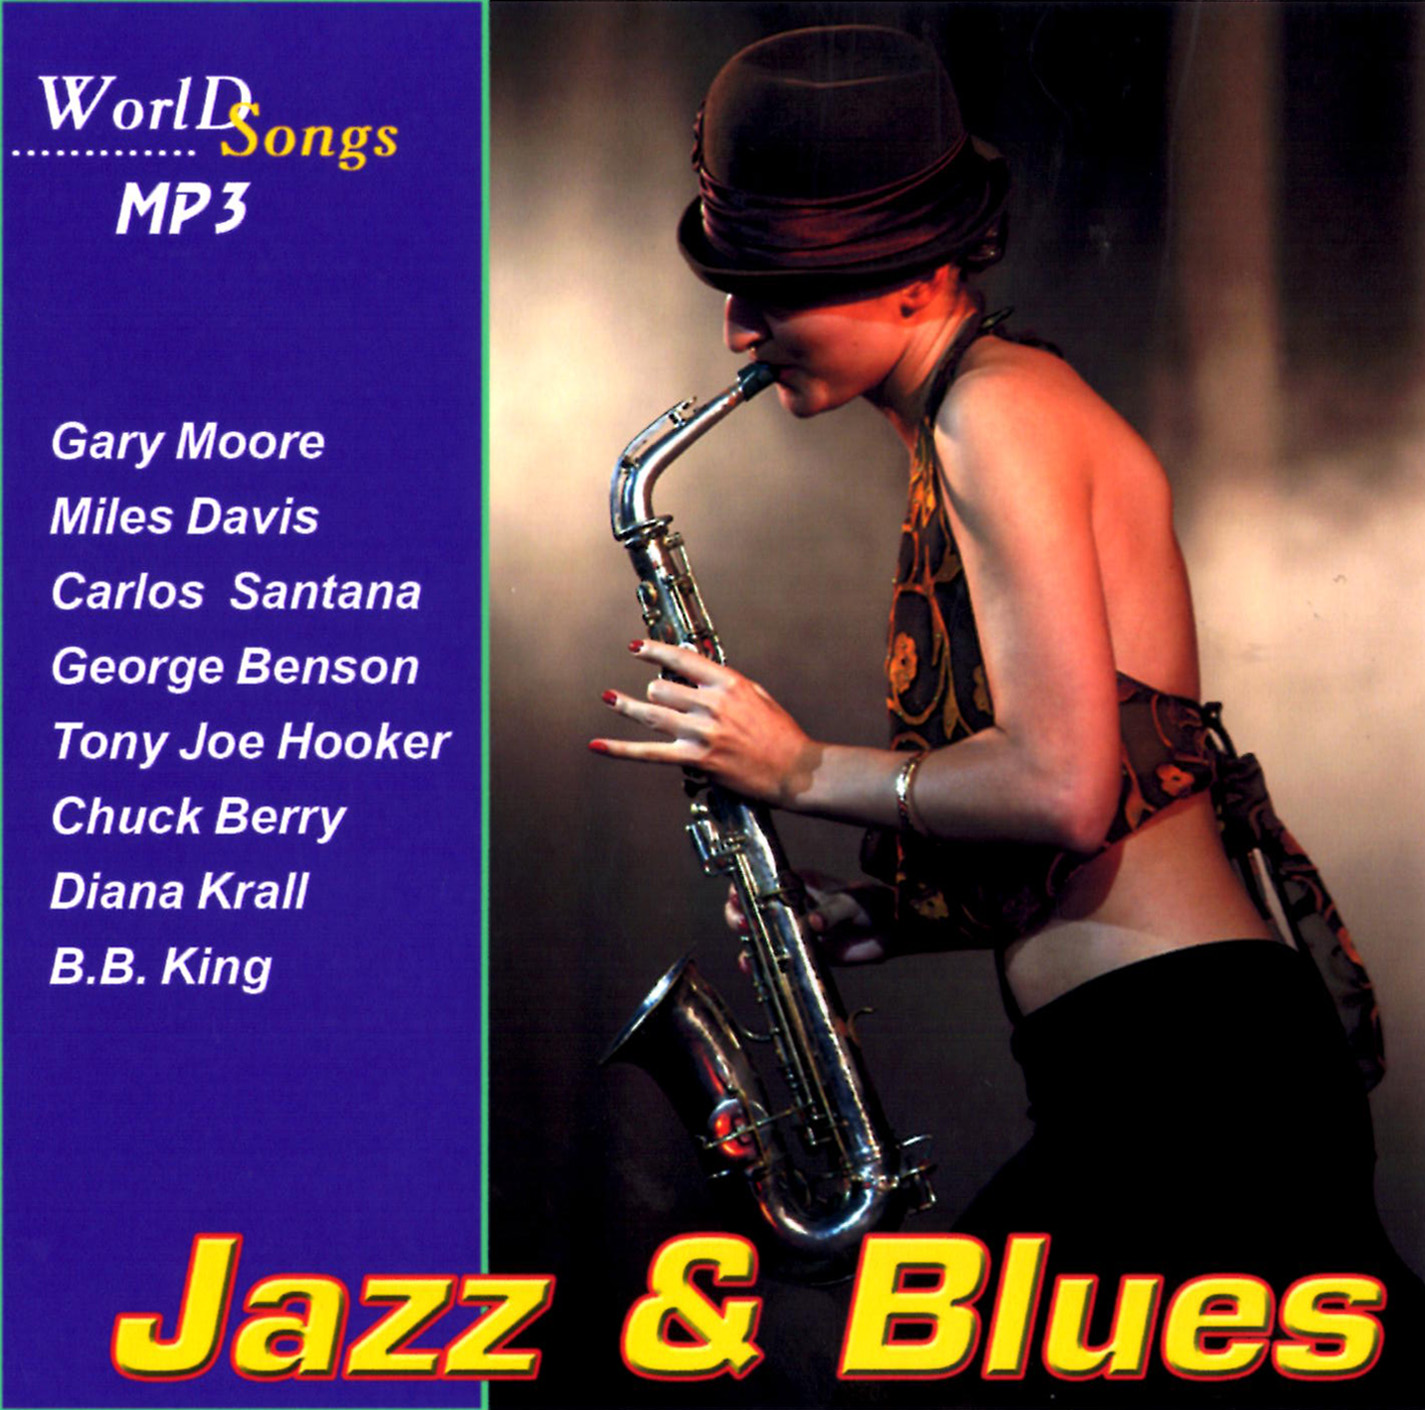 Jazz & Blues [mp3]